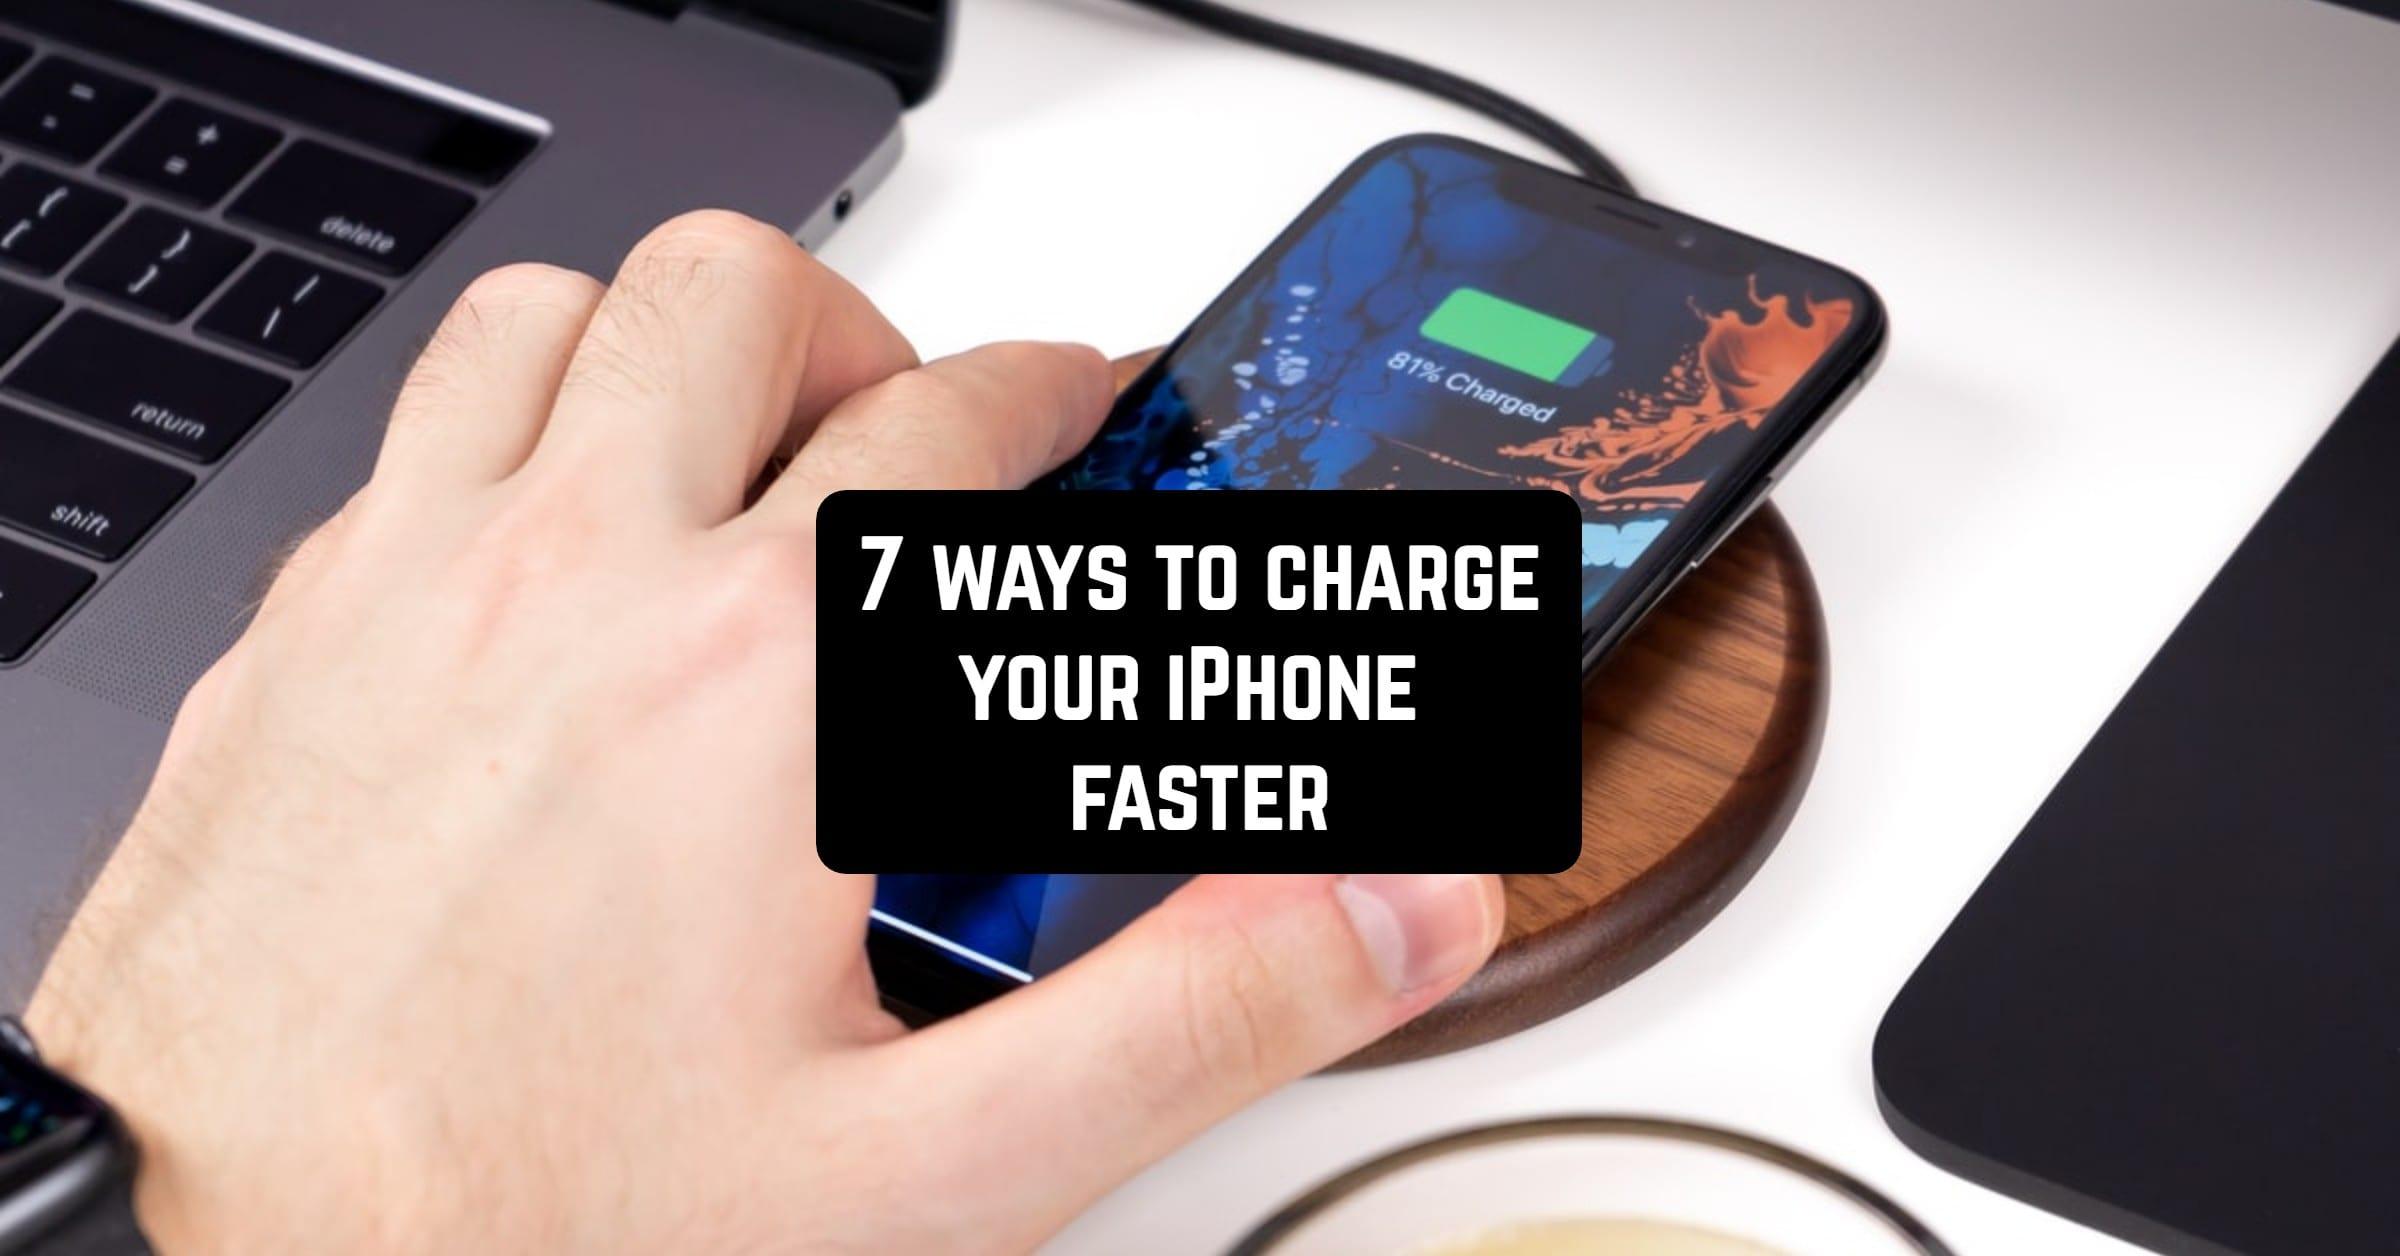 iphonecharge1